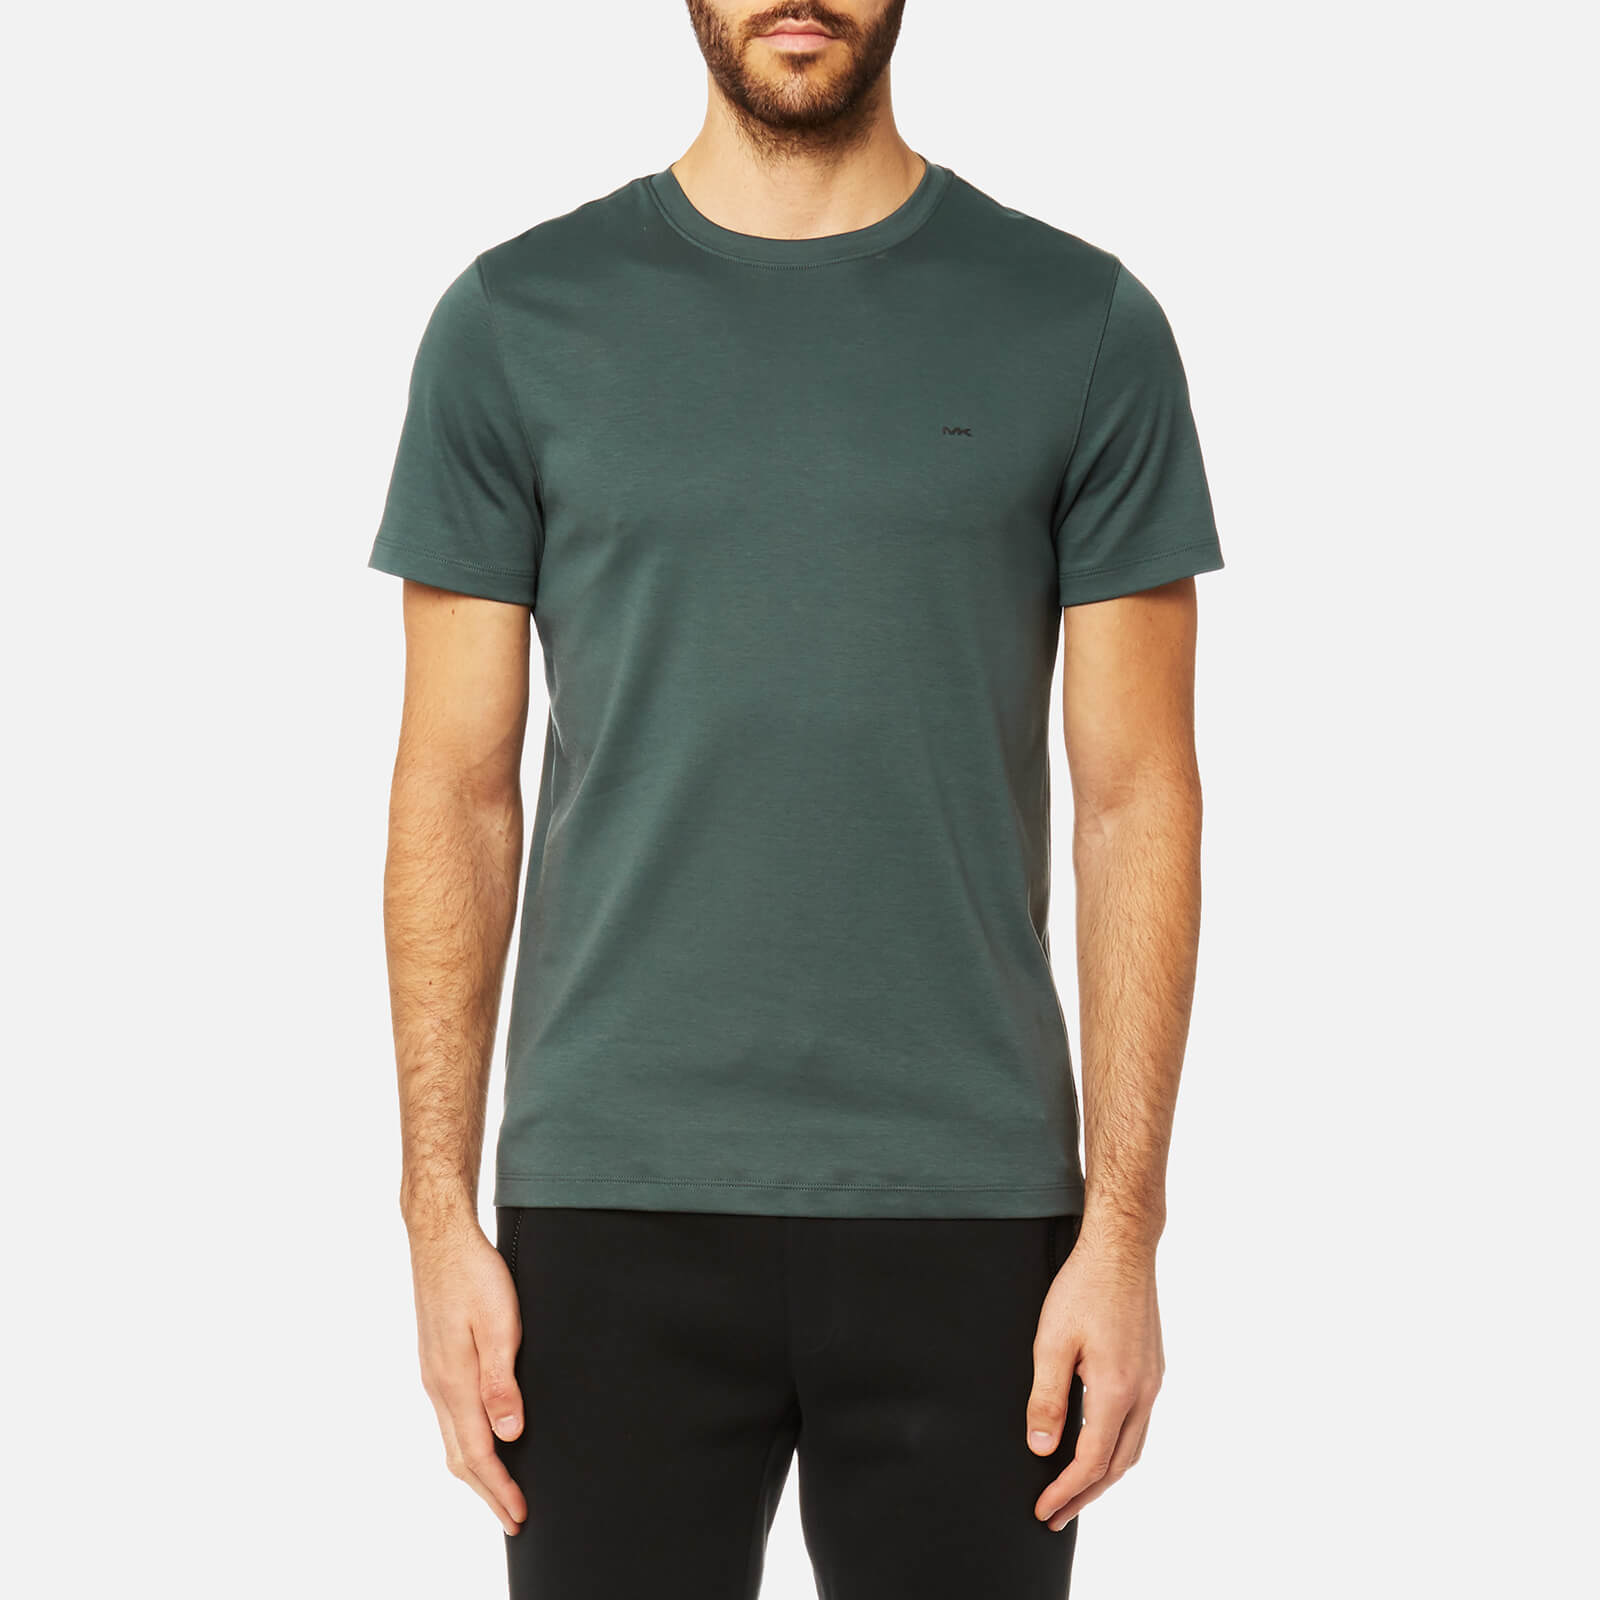 4bdcb13b4d797a Michael Kors Men's Liquid Jersey Short Sleeve Crew Neck T-Shirt - Cedar  Green - Free UK Delivery over £50